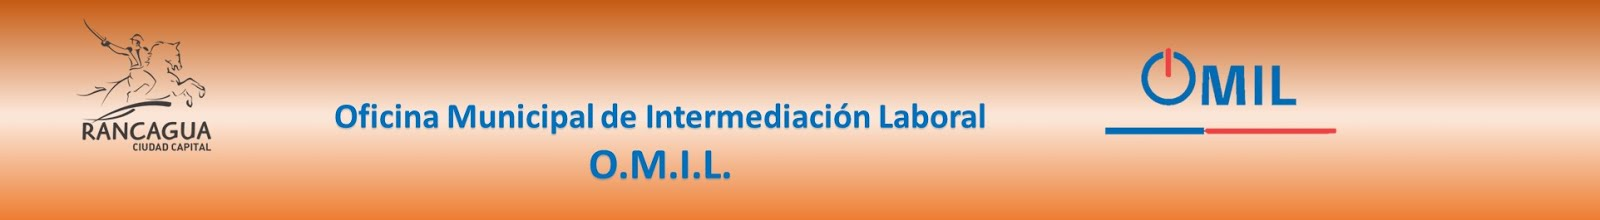 Oficina Municipal de Intermediación Laboral OMIL Rancagua.